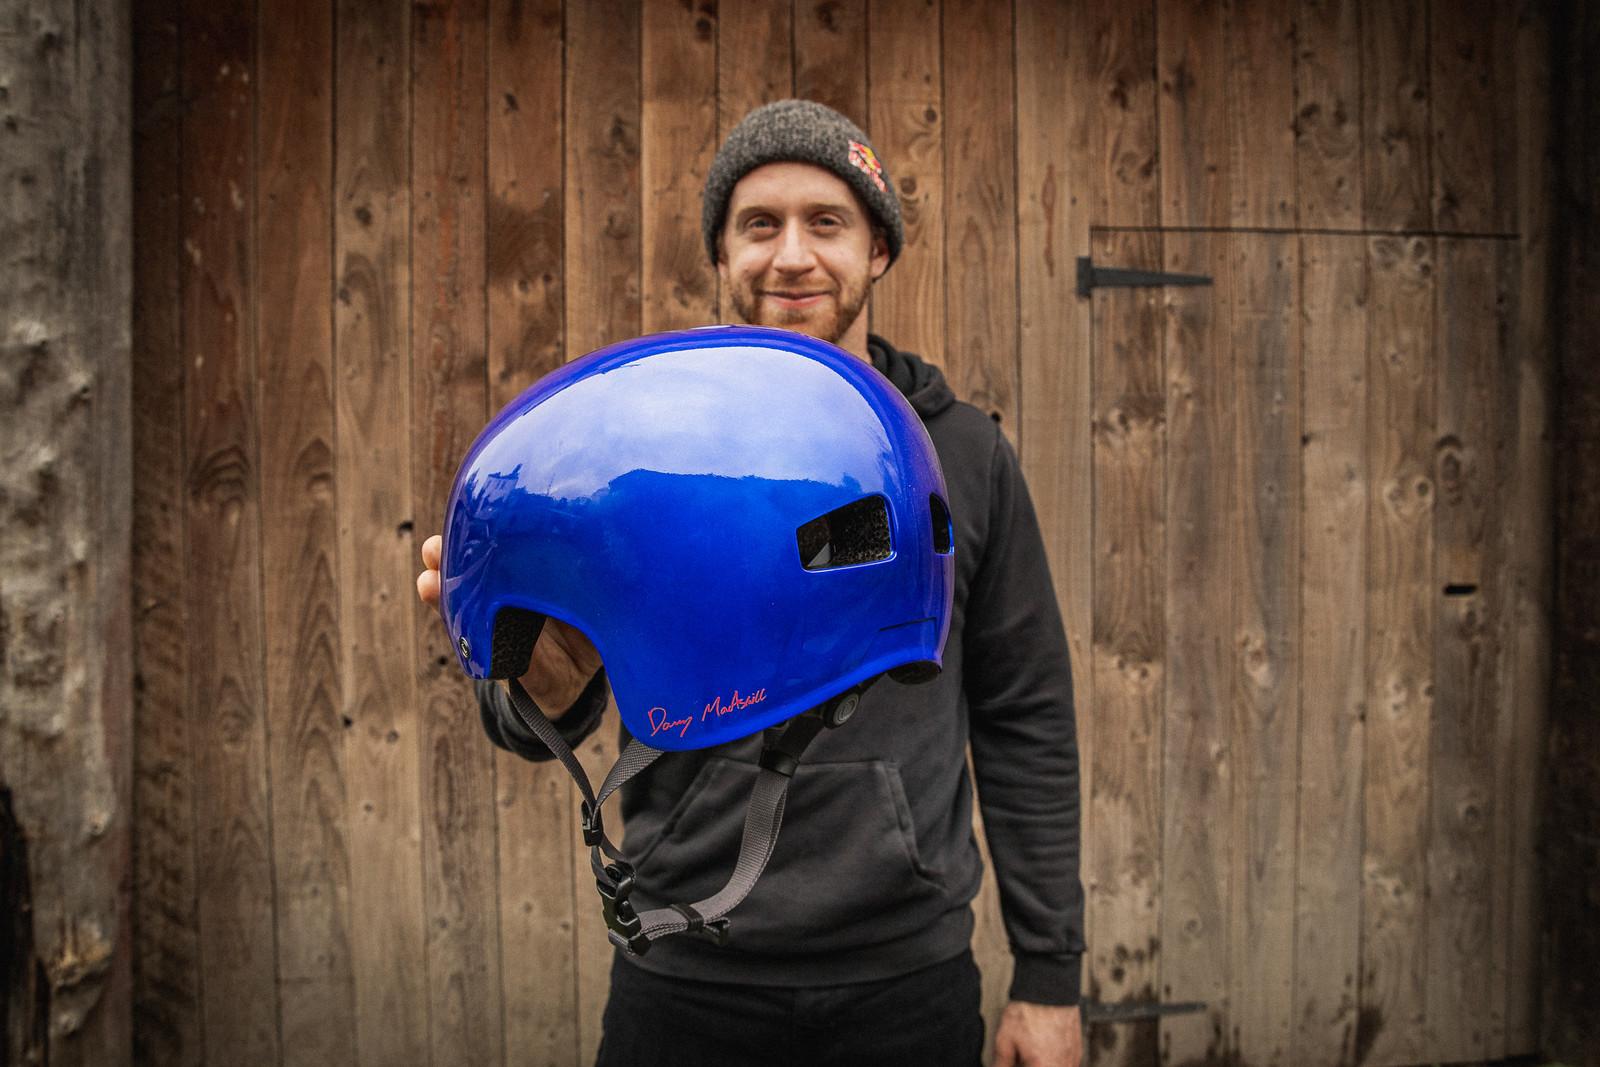 Danny MacAskill's Signature Helmet from Endura